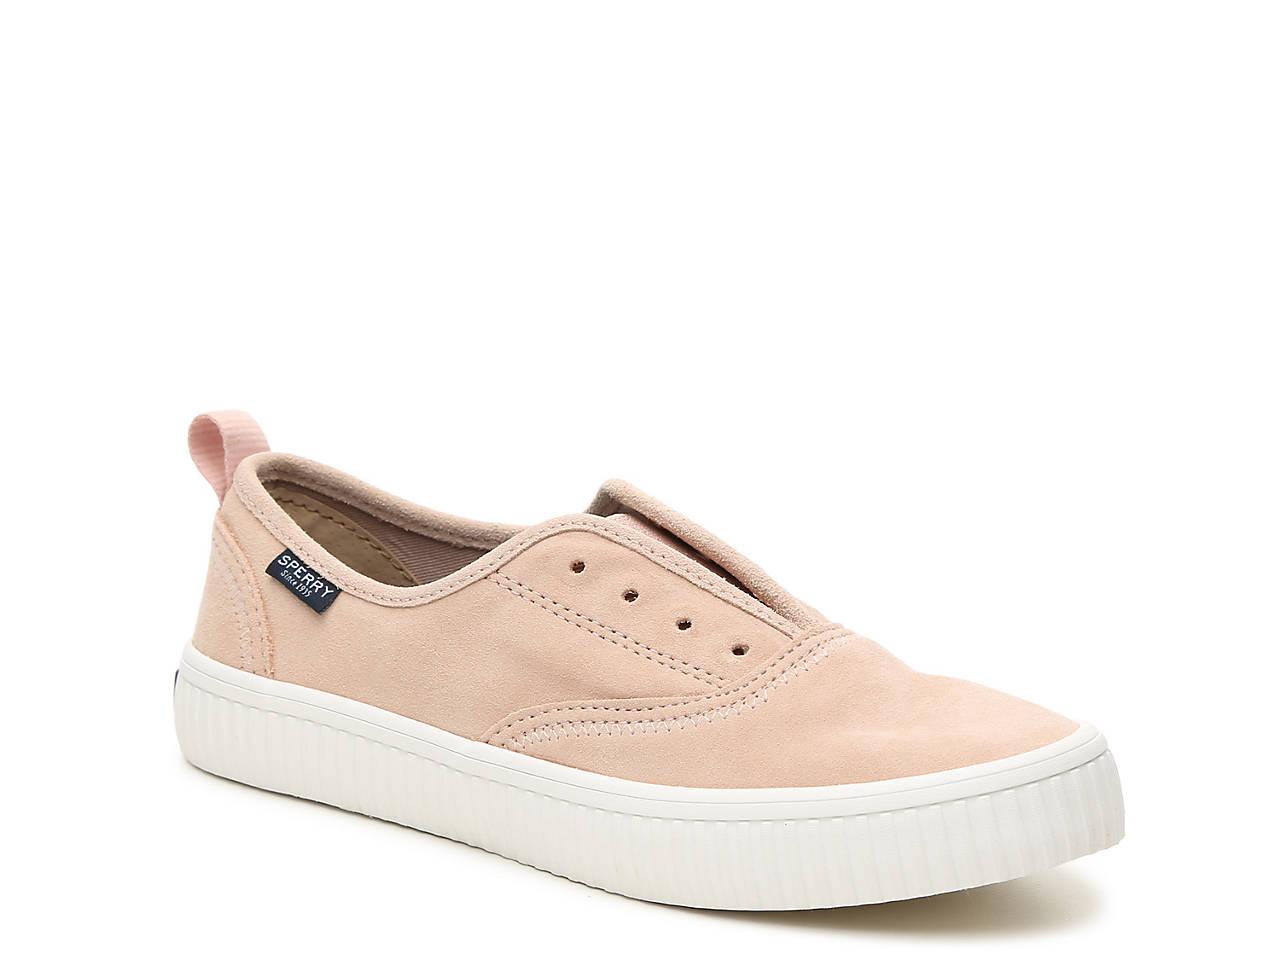 Sperry Top-Sider Crest Creep Slip-On Sneaker Women s Shoes  1e0021485